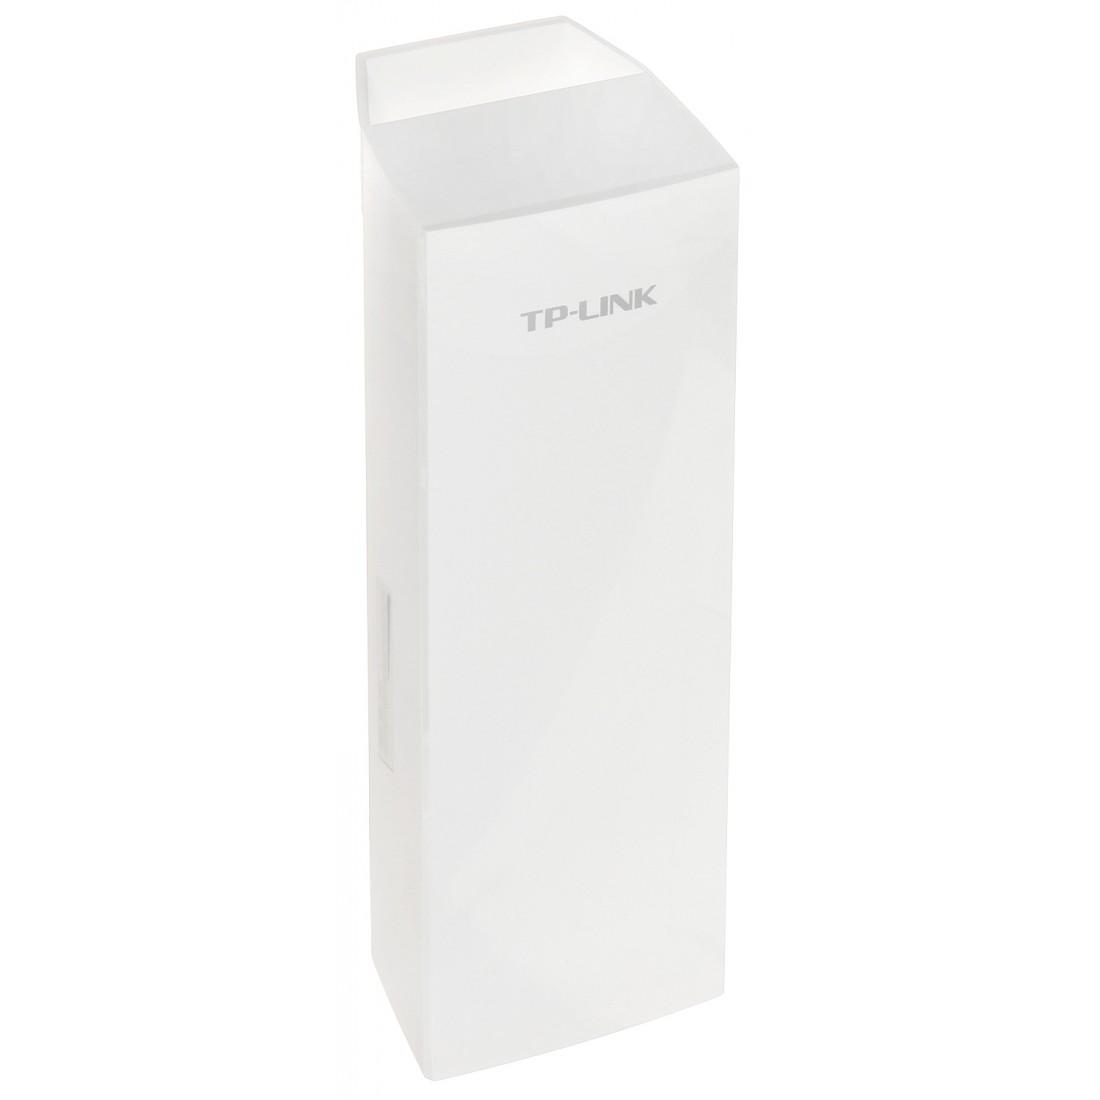 PRÍSTUPOVÝ BOD TL-CPE210 2.4 GHz TP-LINK